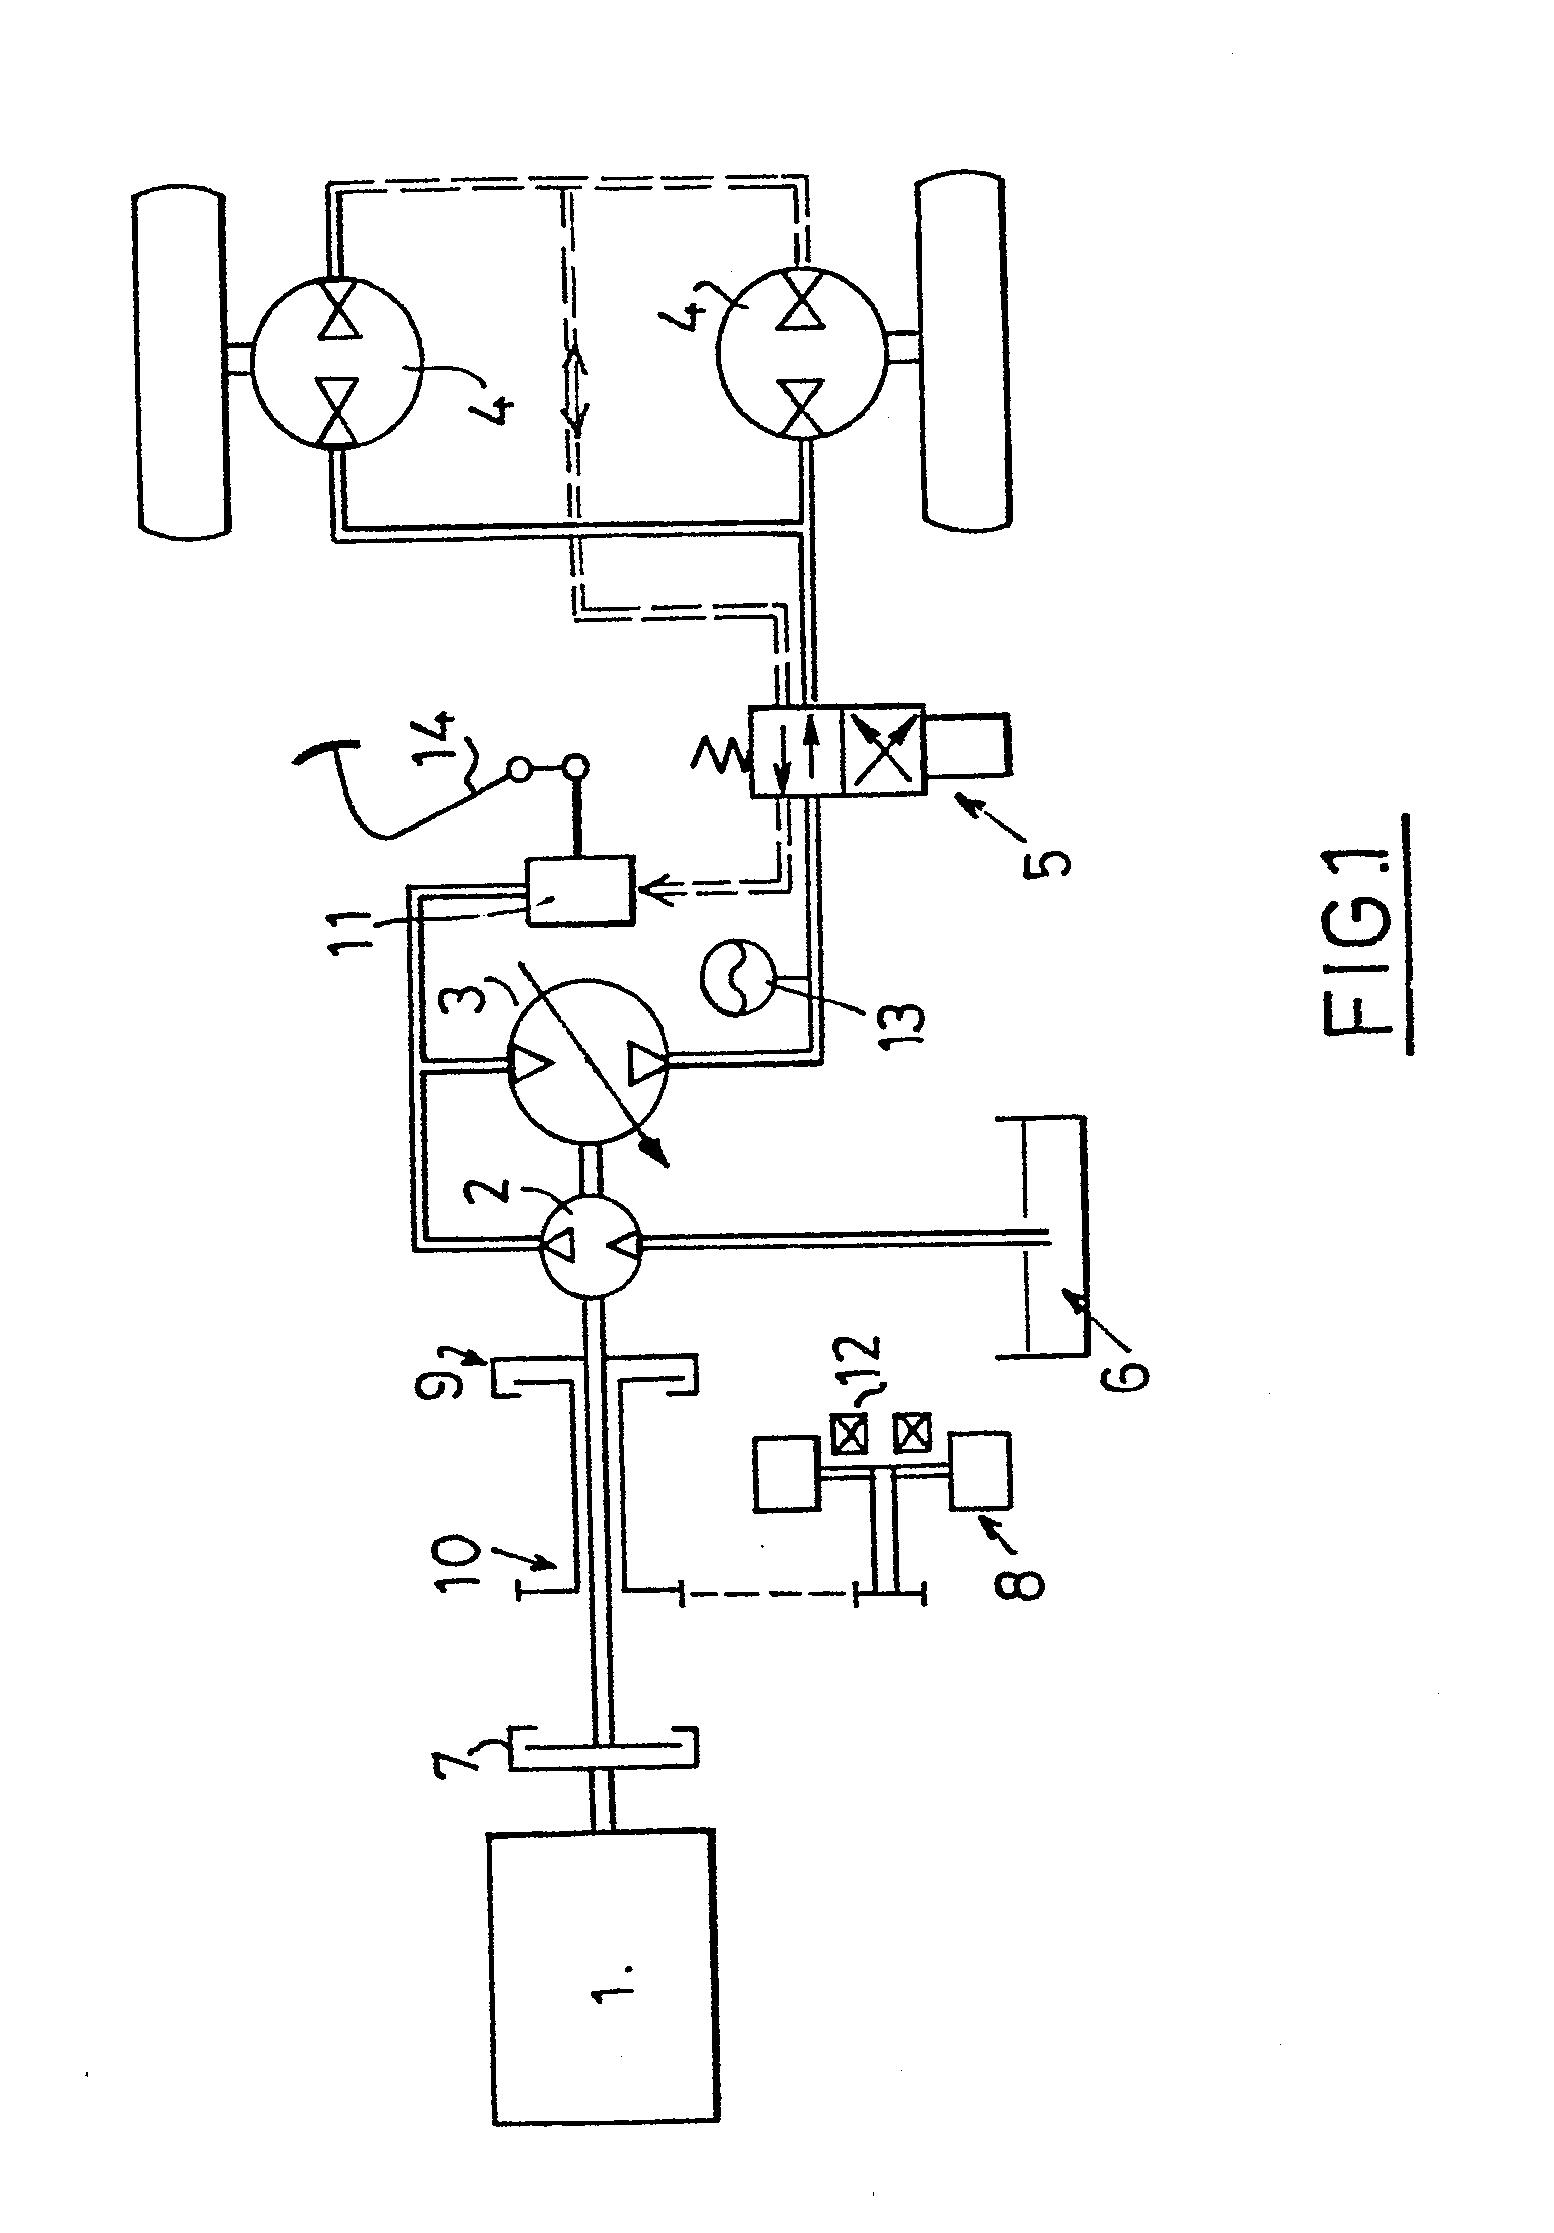 patent ep0131505a1 hydrostatic transmission with integral braking energy recuperation google. Black Bedroom Furniture Sets. Home Design Ideas